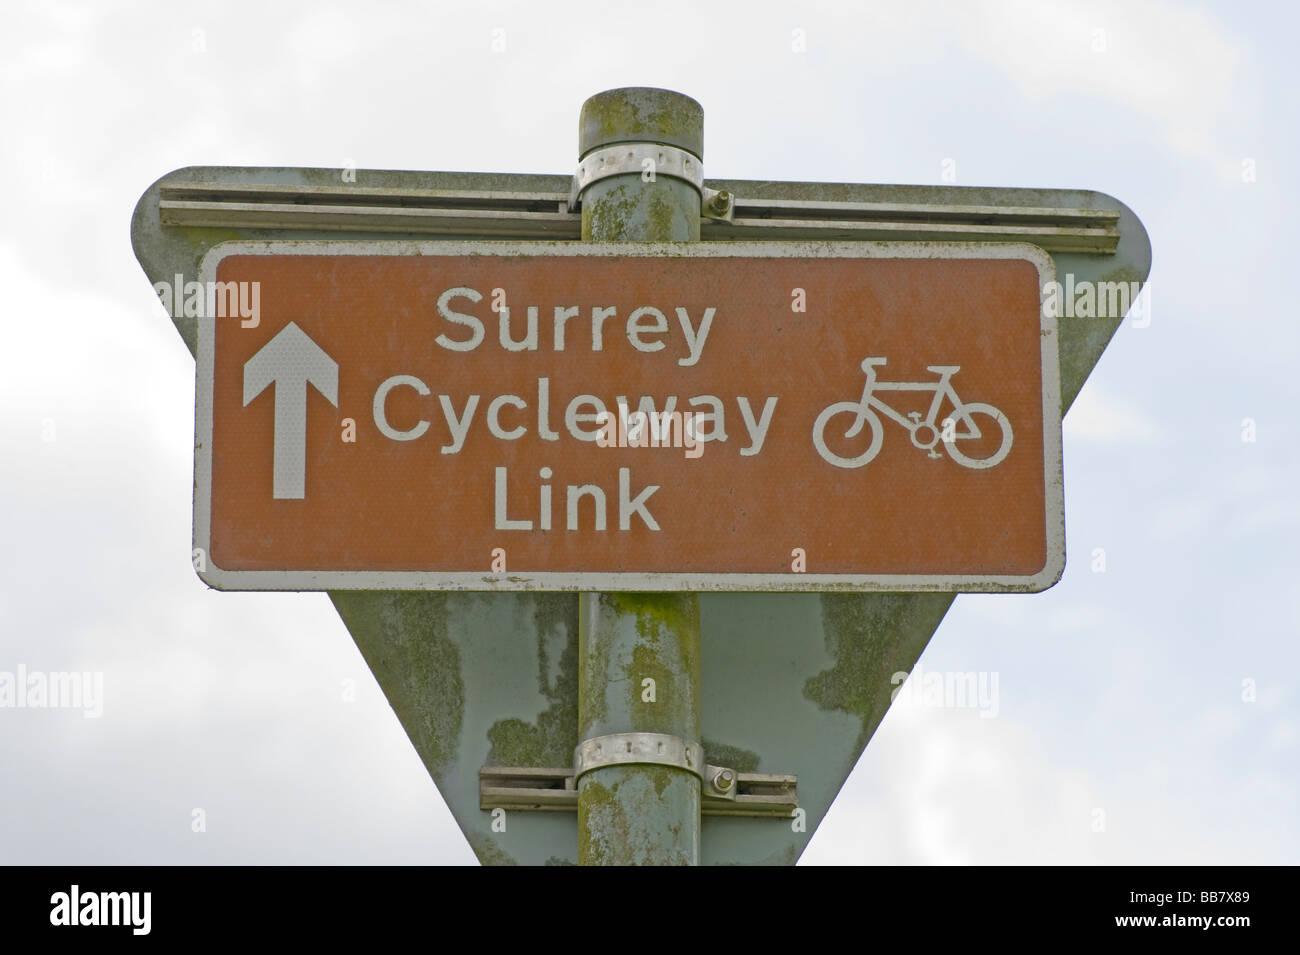 Surrey Cycleway Link Road Sign - Stock Image